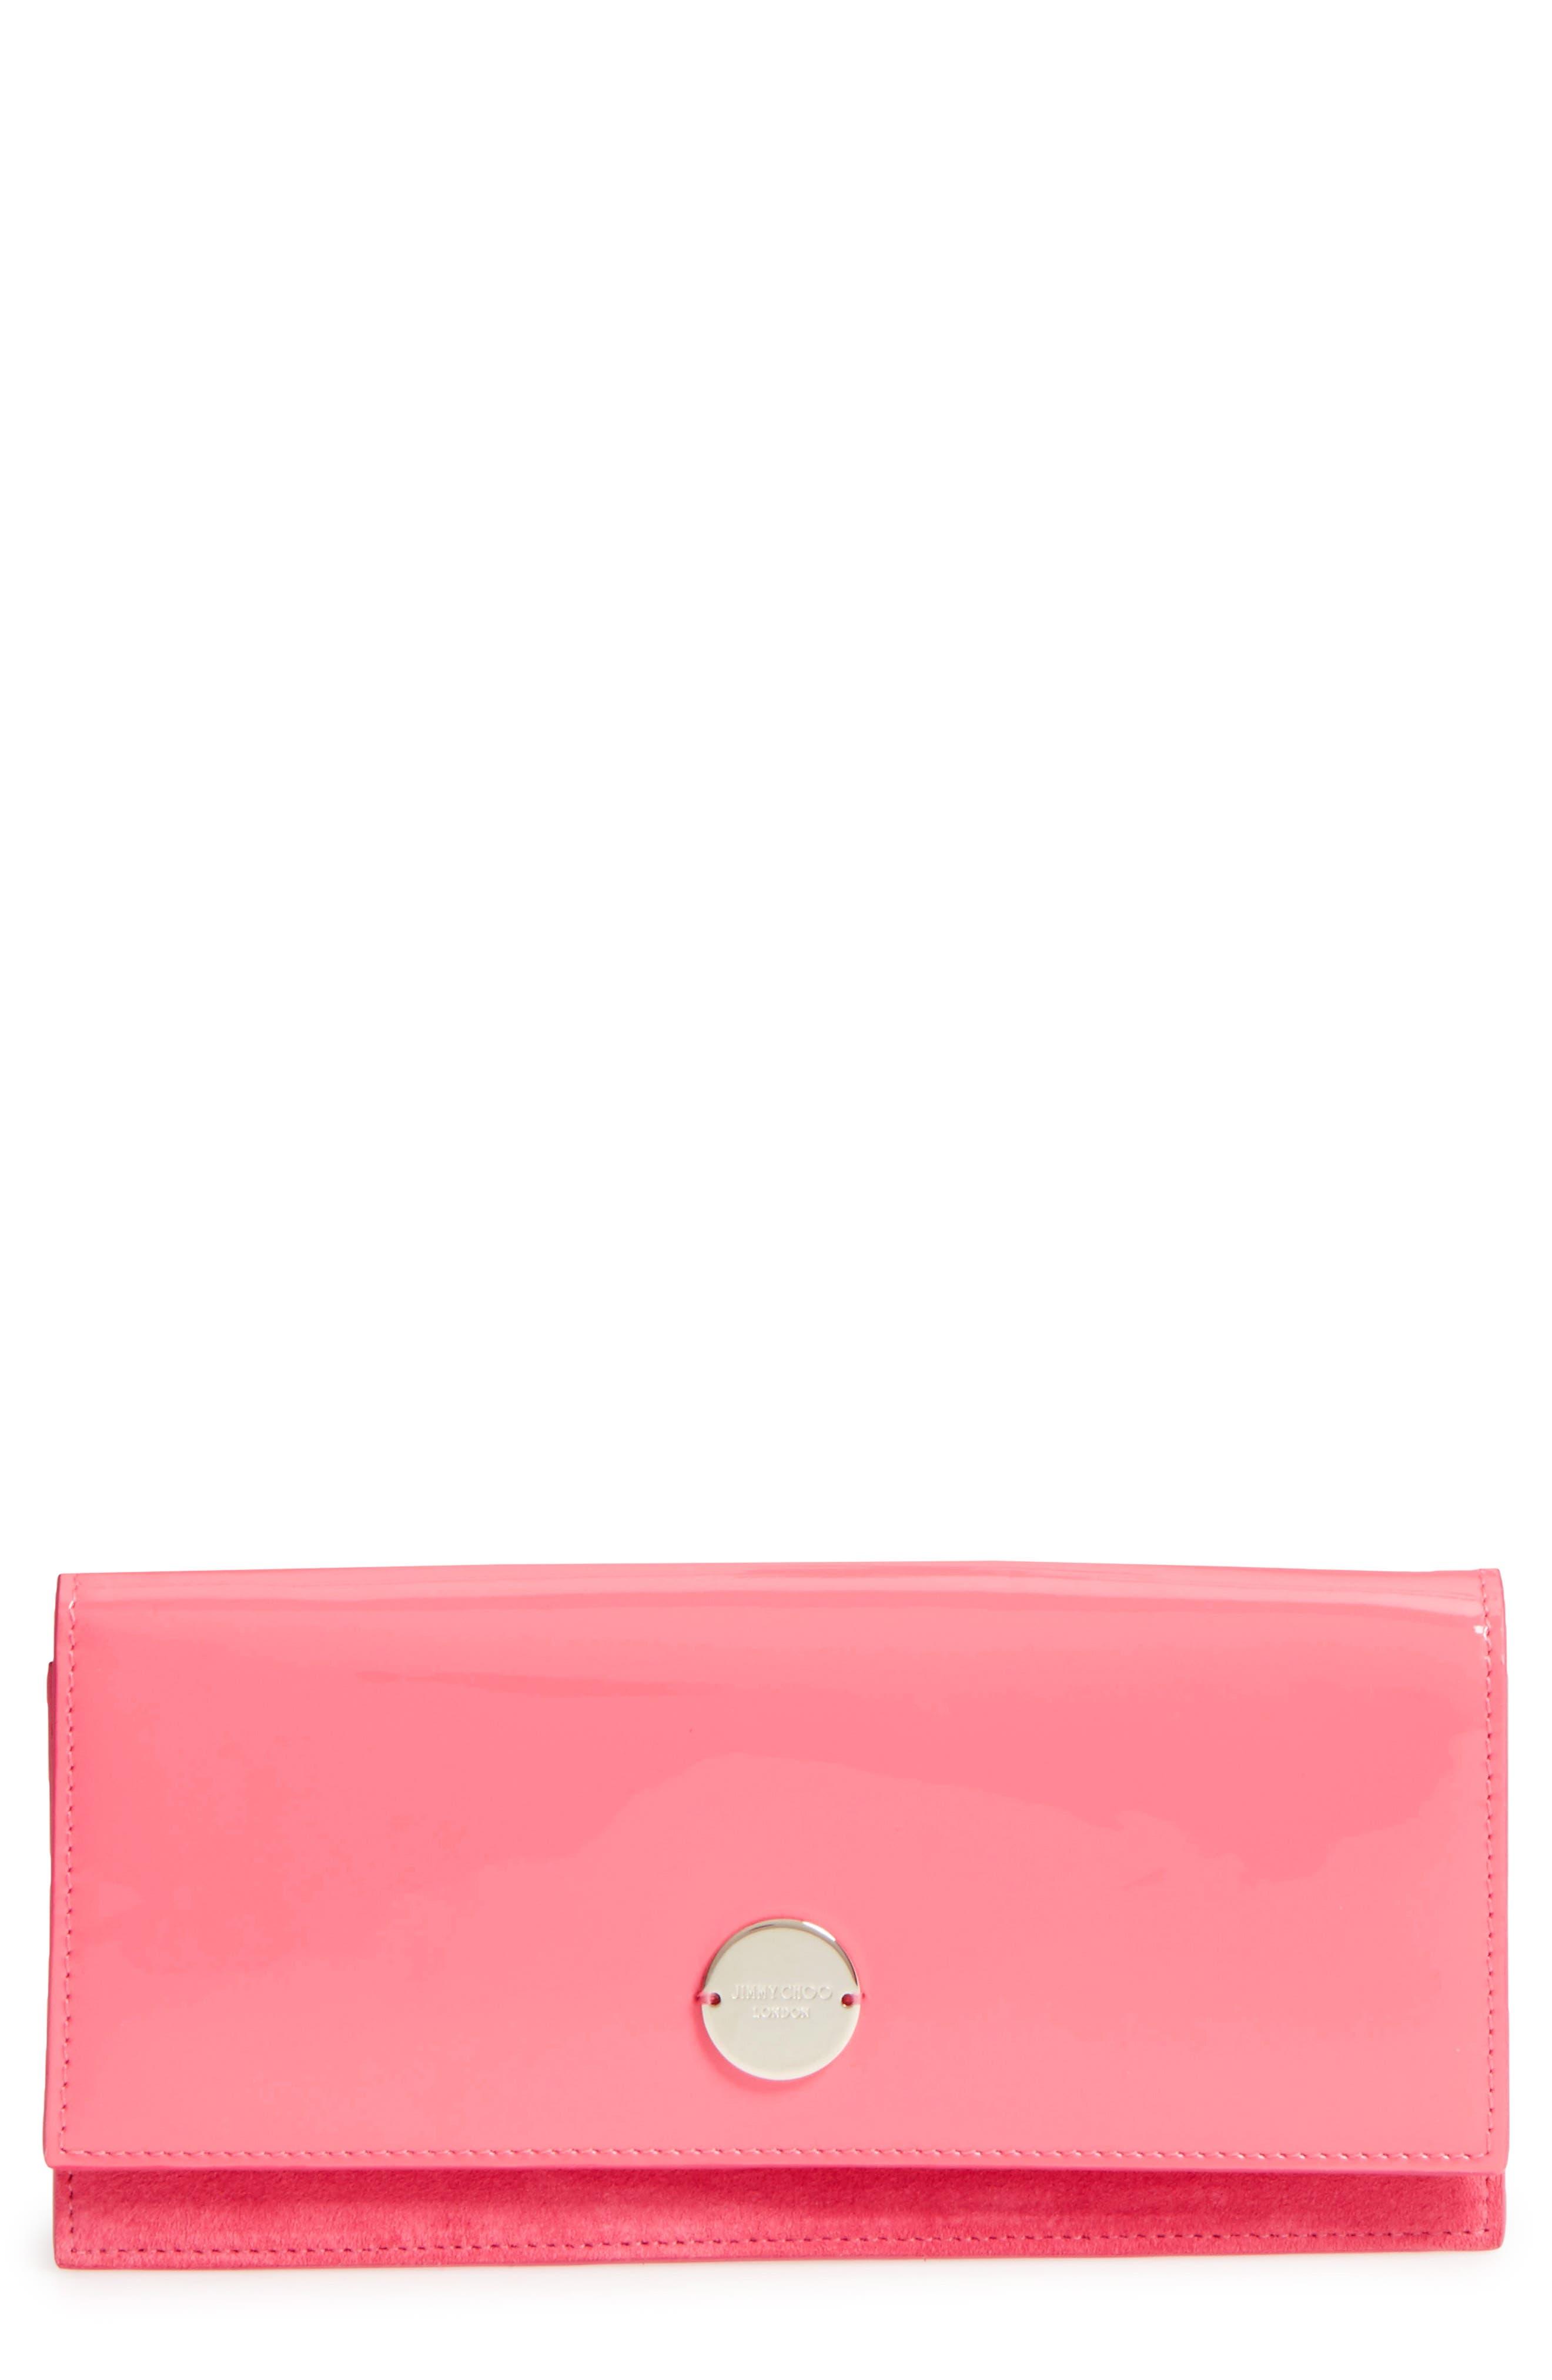 Fie Suede & Patent Leather Clutch,                             Main thumbnail 1, color,                             650